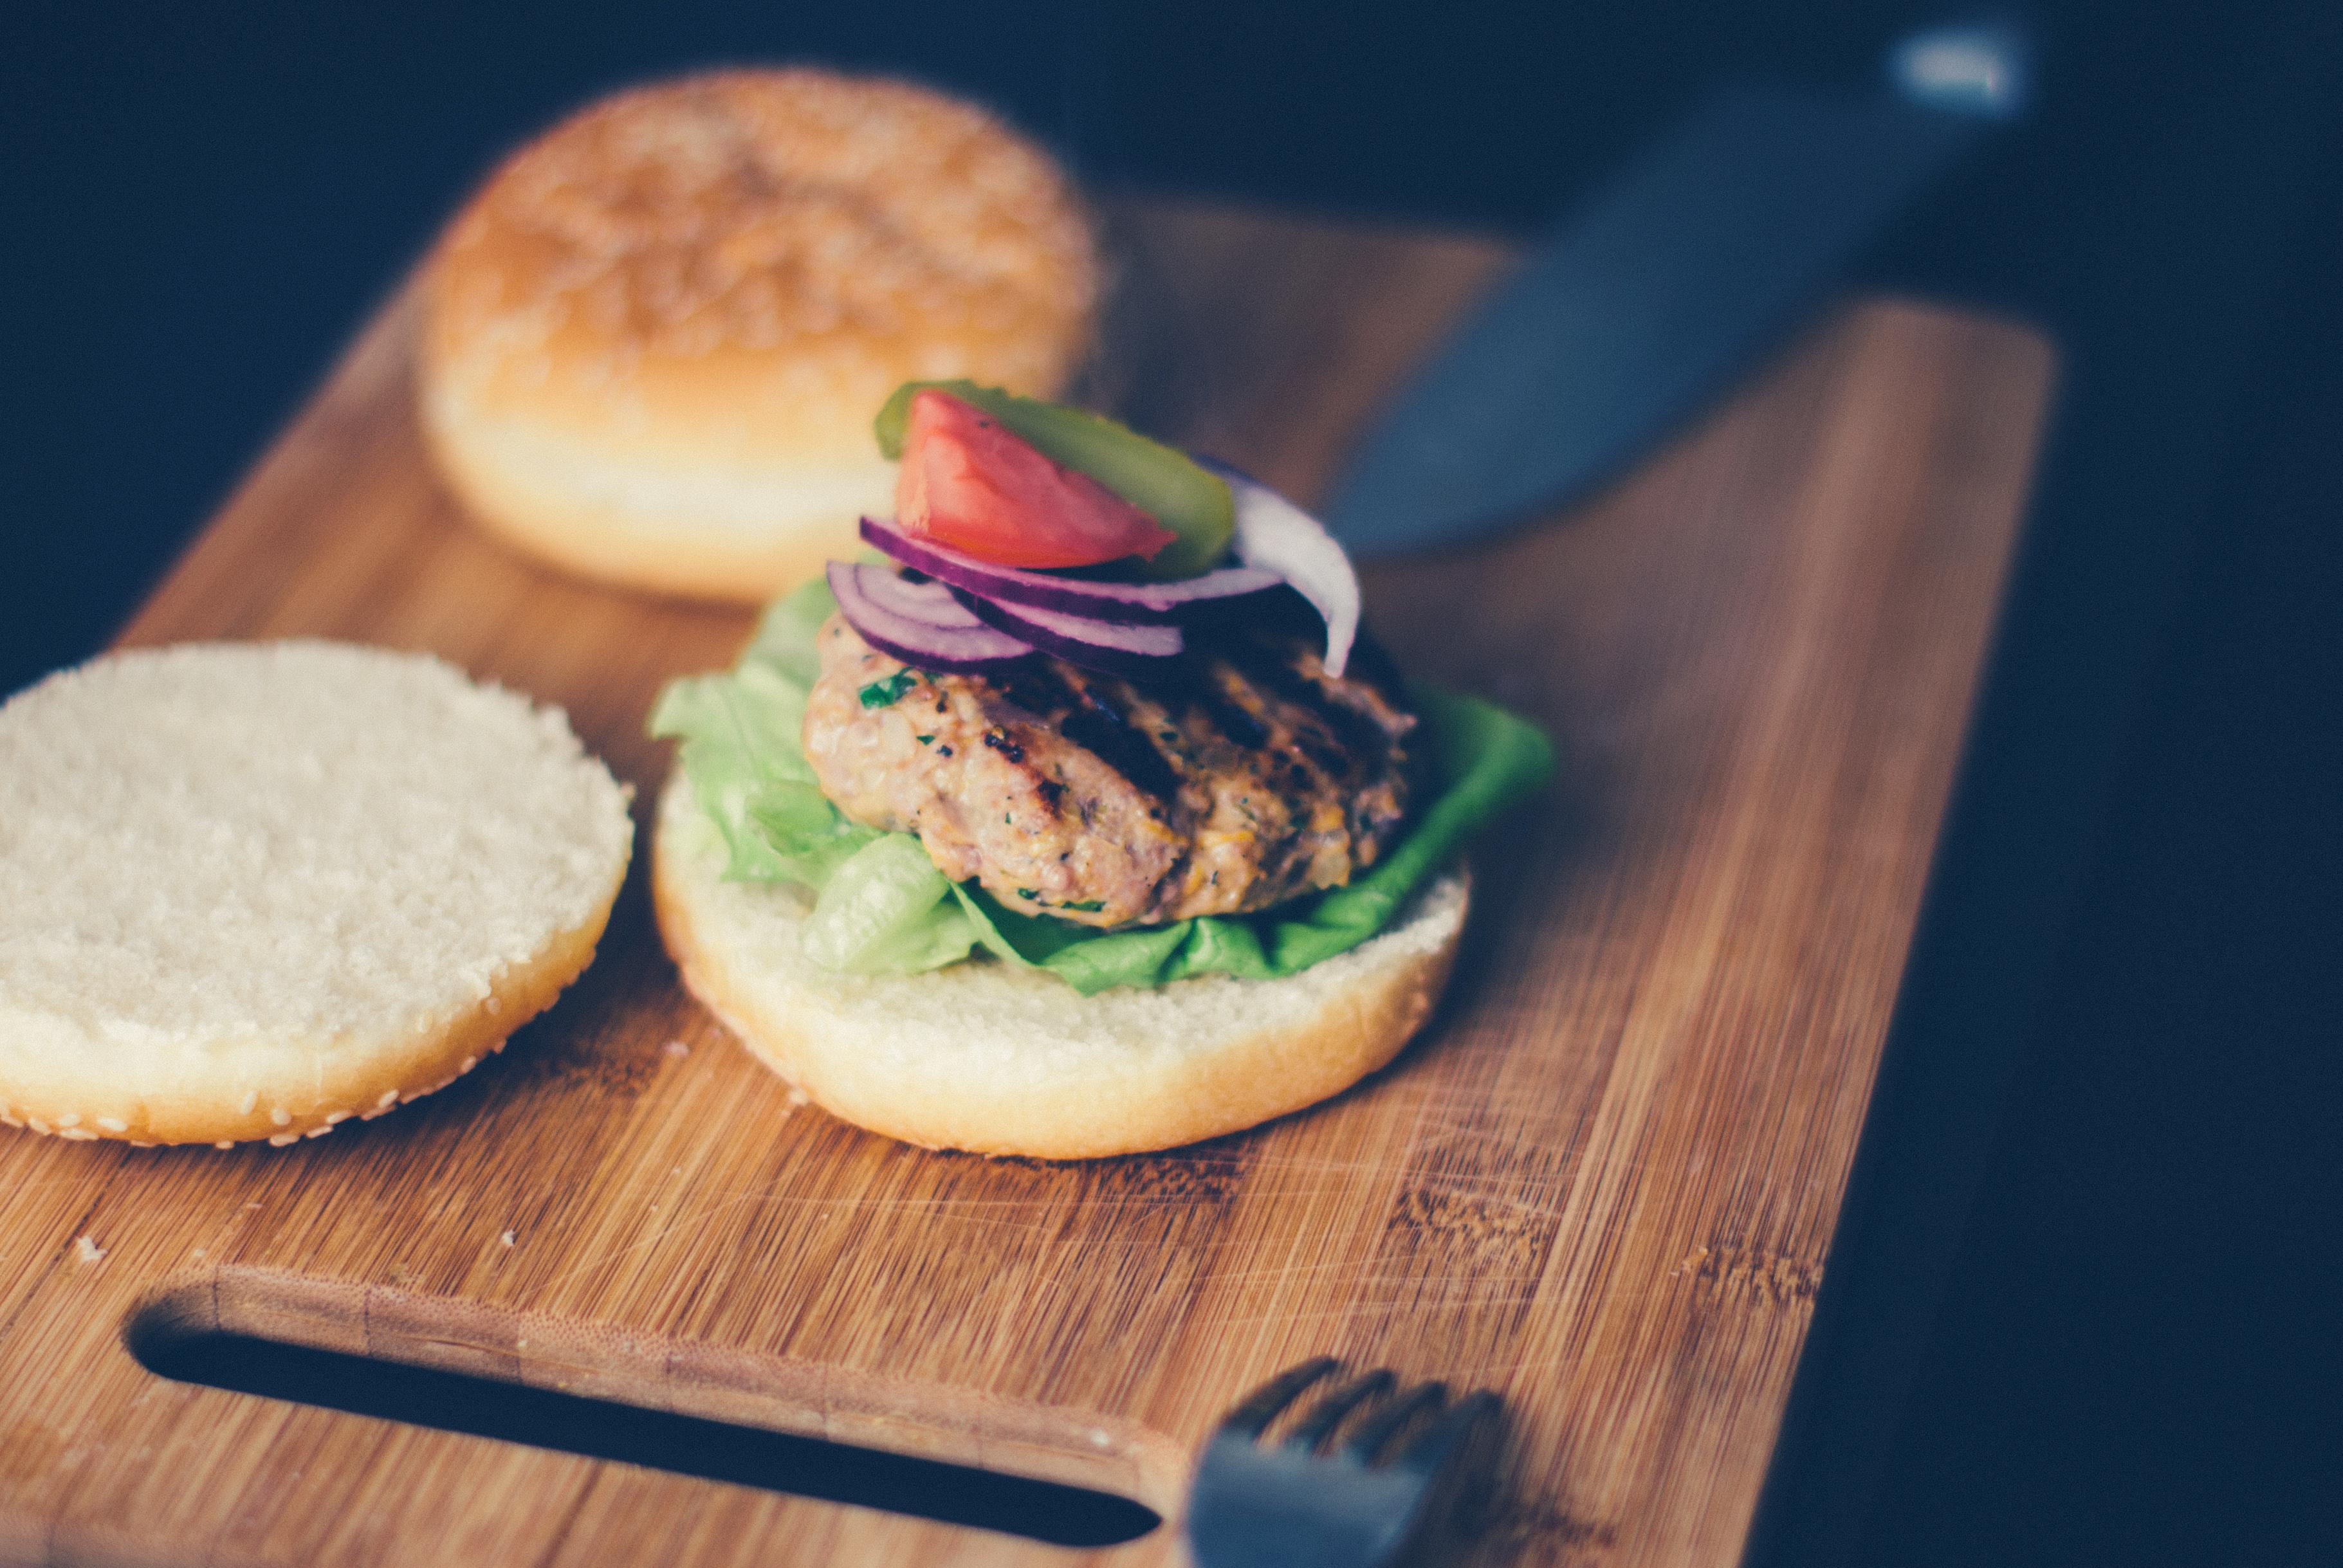 burger-hamburger-onion-tomatoe-80597